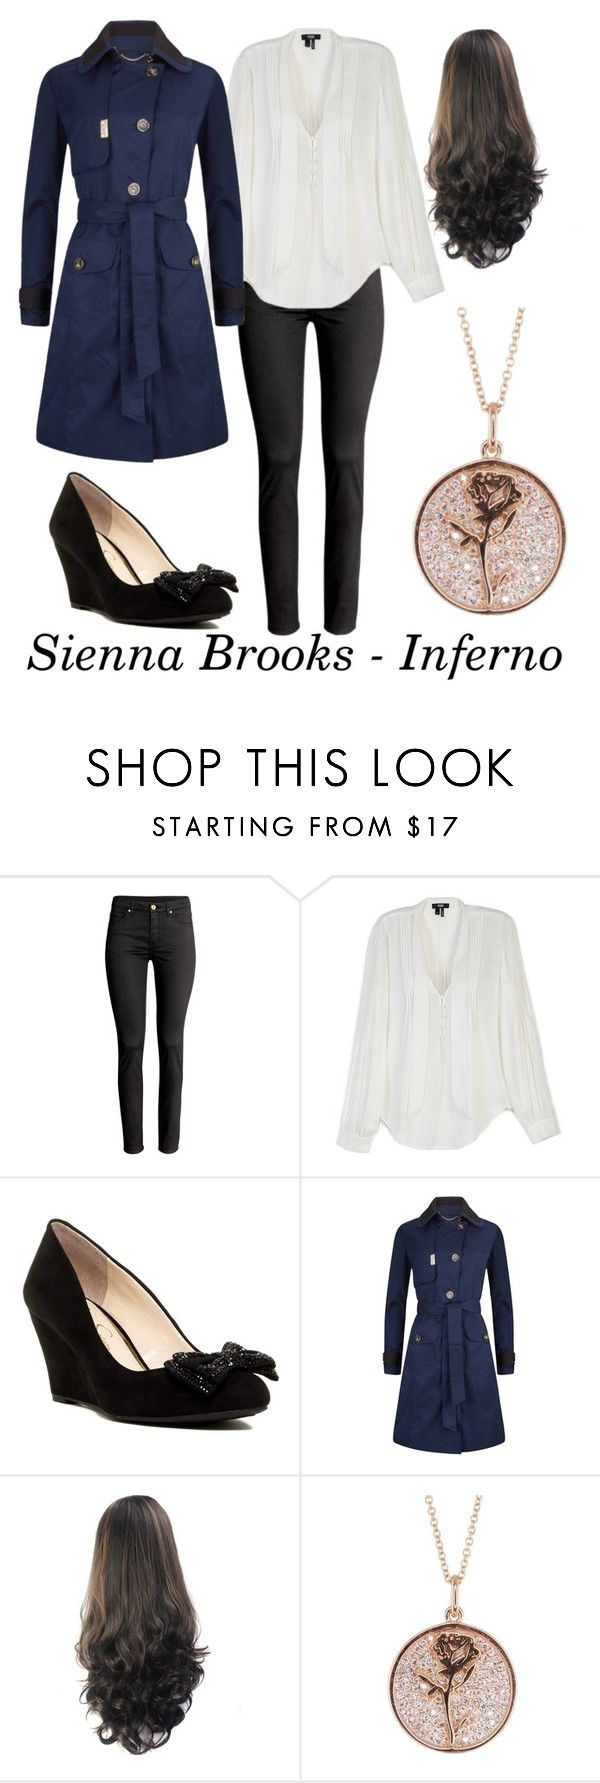 """Sienna Brooks - Inferno"" by kacenka-1 ❤ liked on Polyvore featuring Paige Denim, Jessica Simpson, PIOGG and Luna Skye"